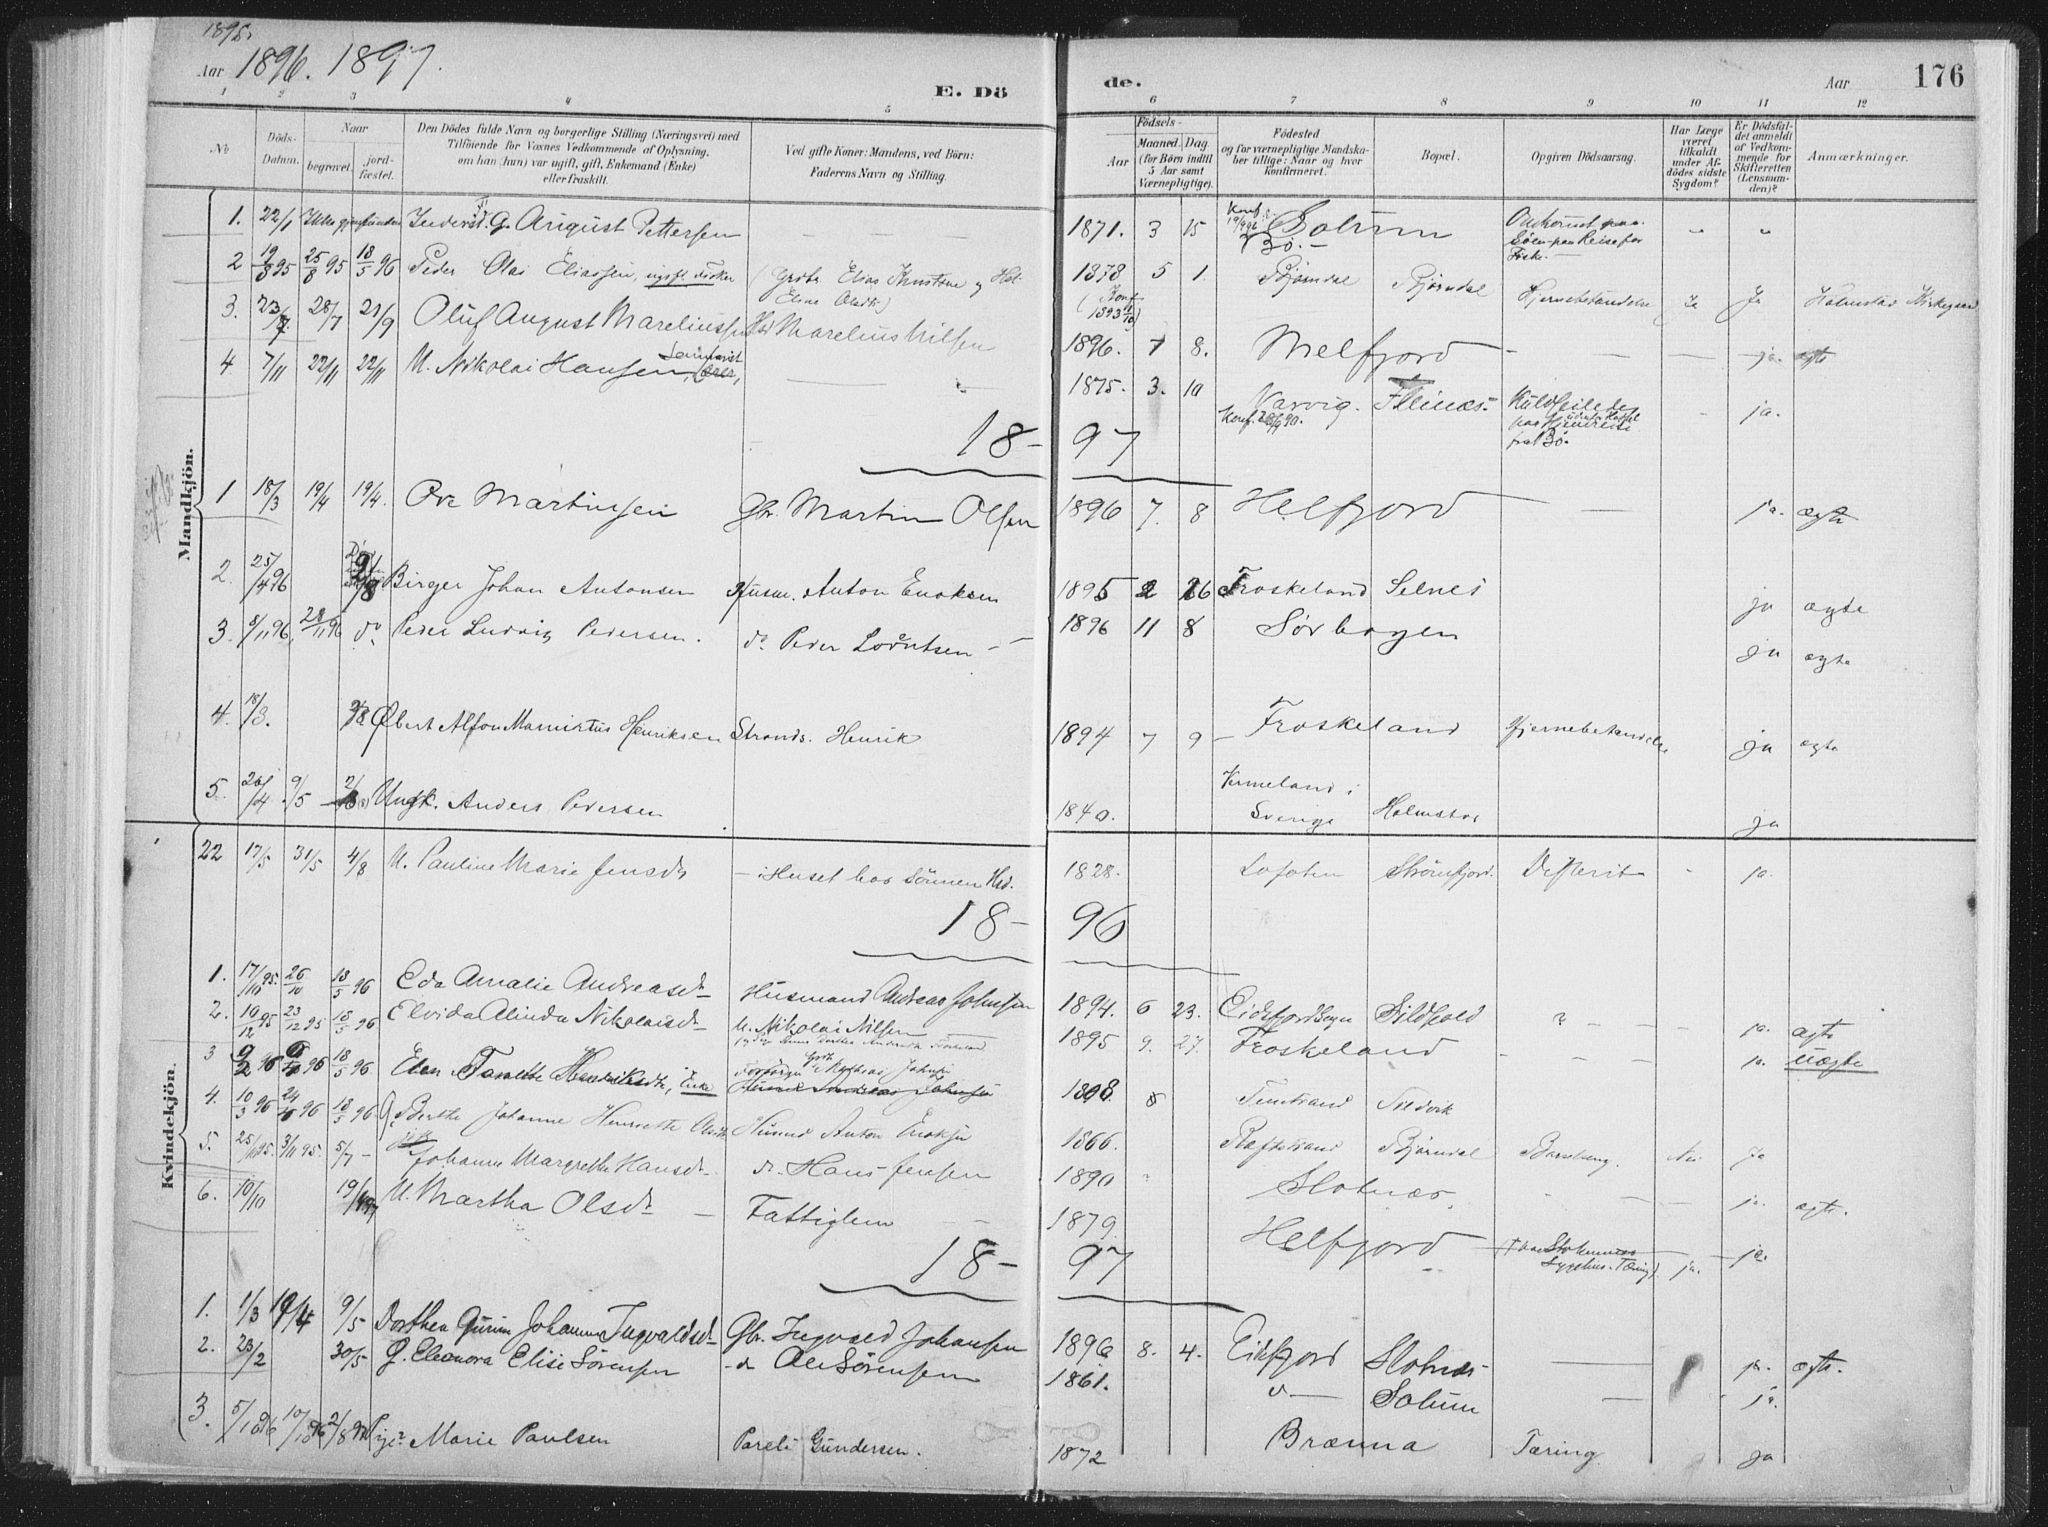 SAT, Ministerialprotokoller, klokkerbøker og fødselsregistre - Nordland, 890/L1286: Ministerialbok nr. 890A01, 1882-1902, s. 176